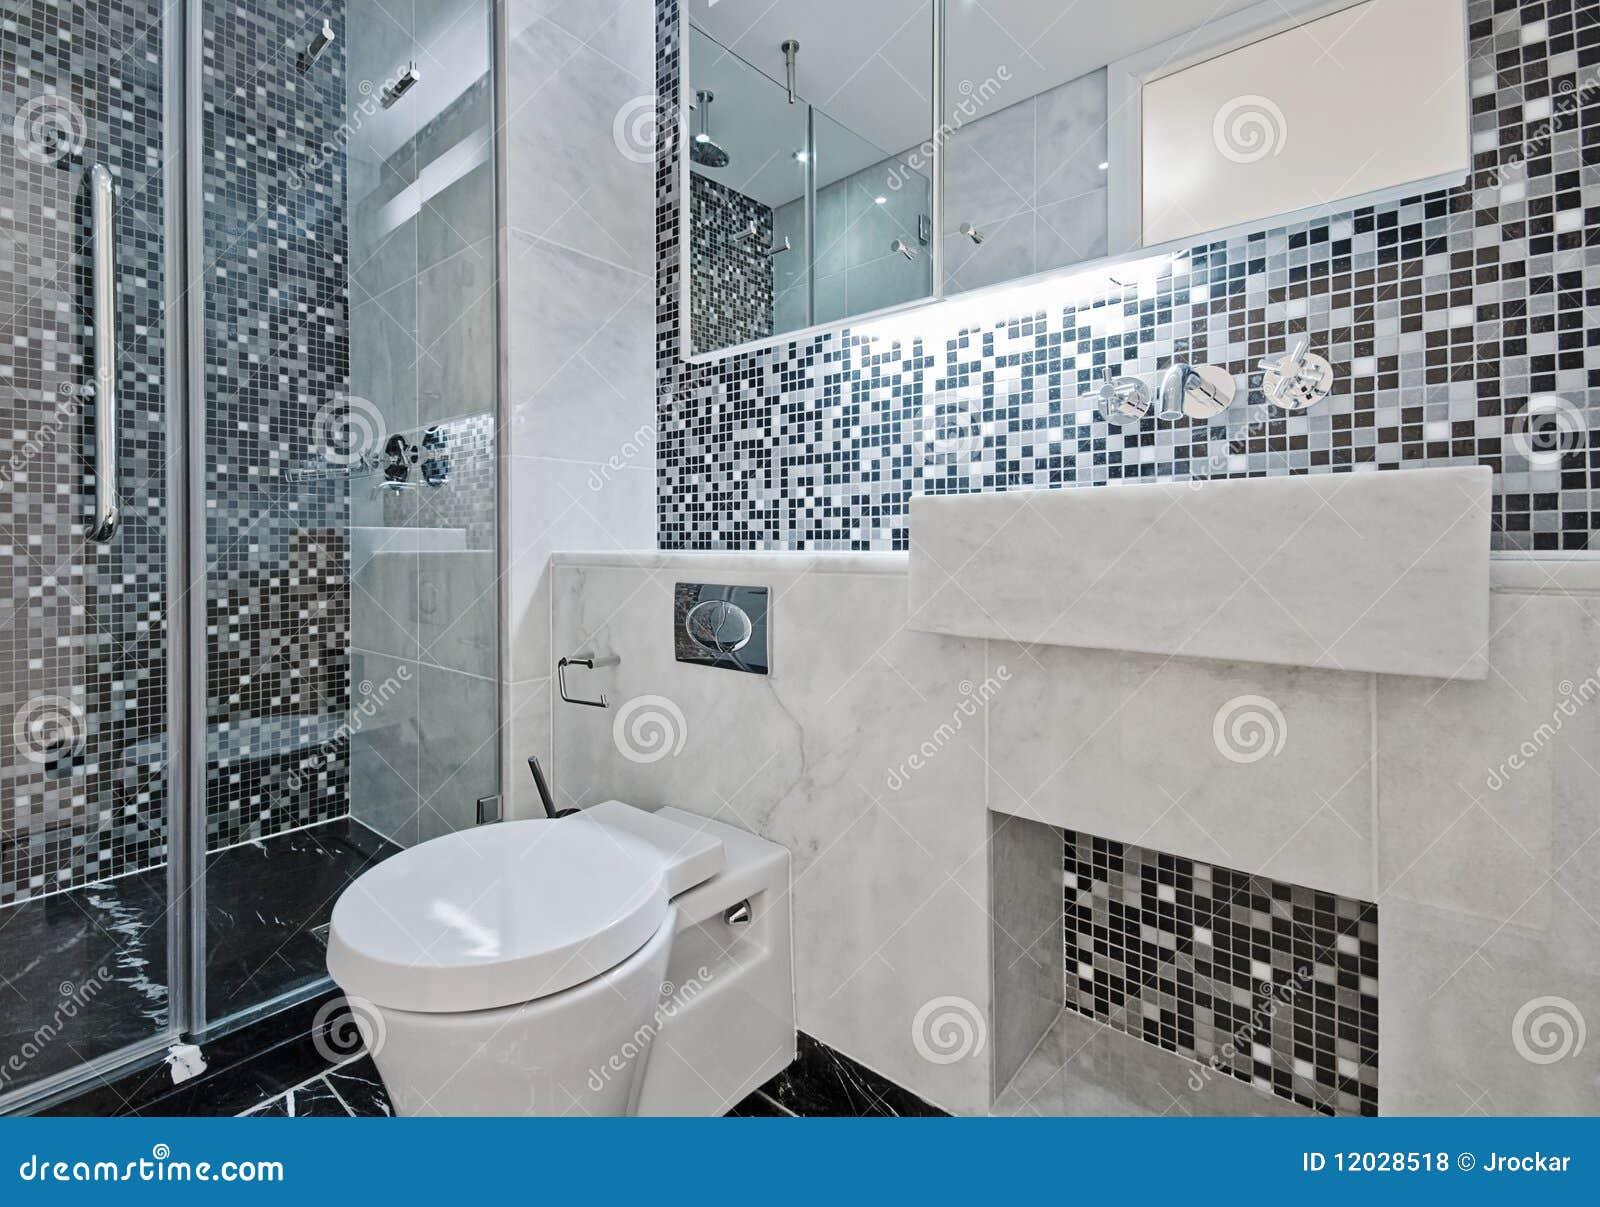 Piastrelle doccia mosaico beautiful awesome piastrelle doccia